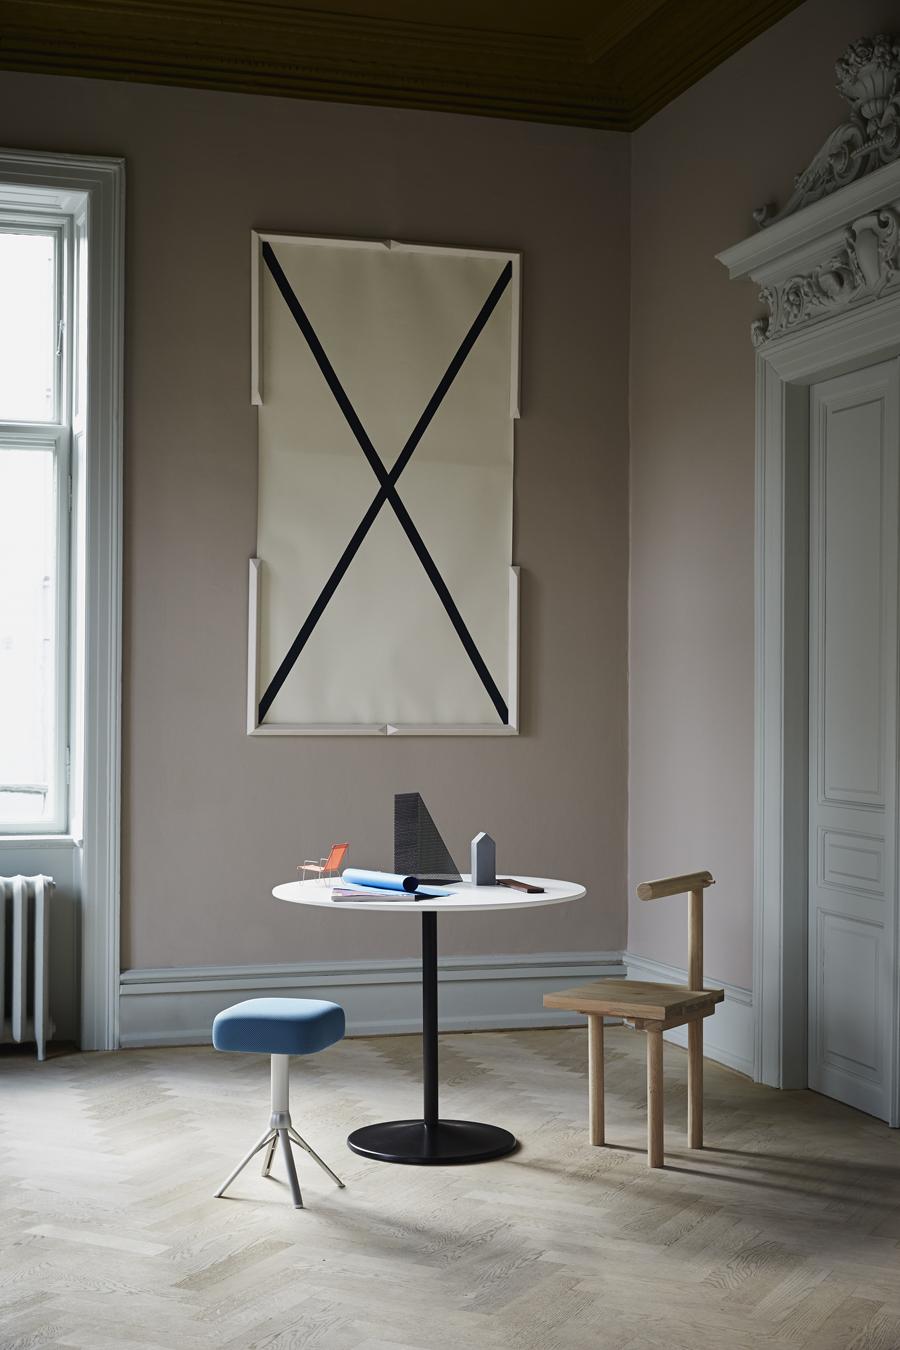 06 Panton table 123